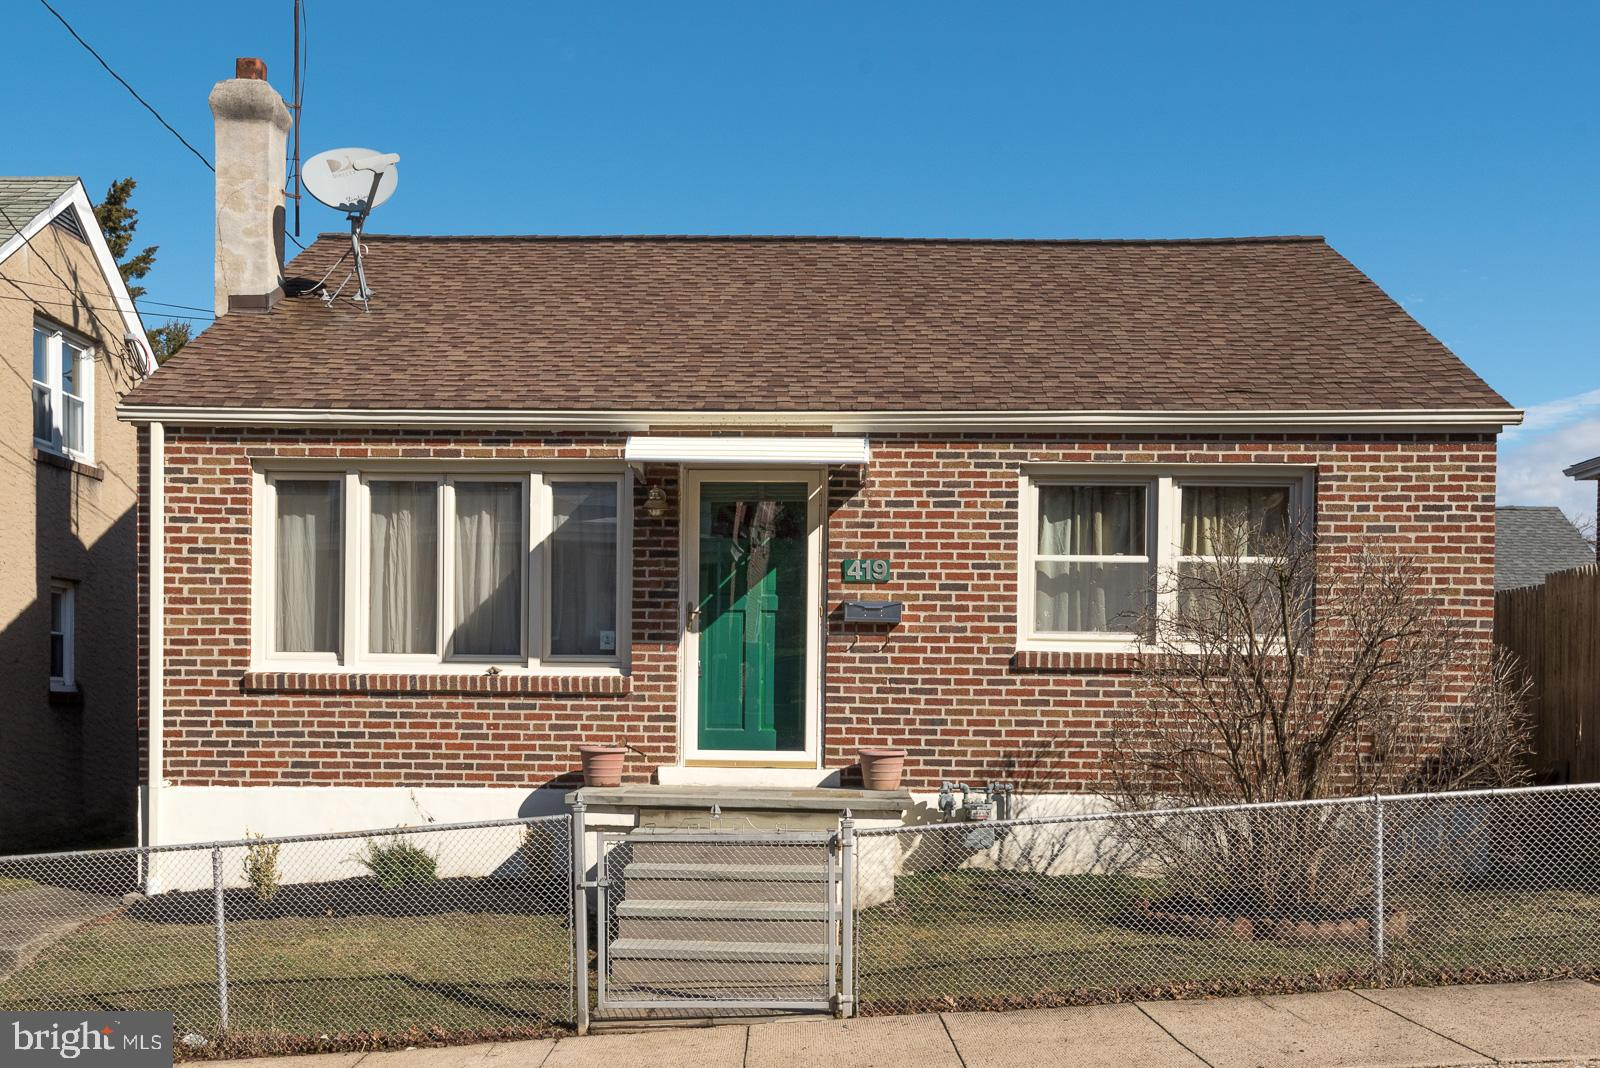 419 E RAMBO STREET, BRIDGEPORT, PA 19405